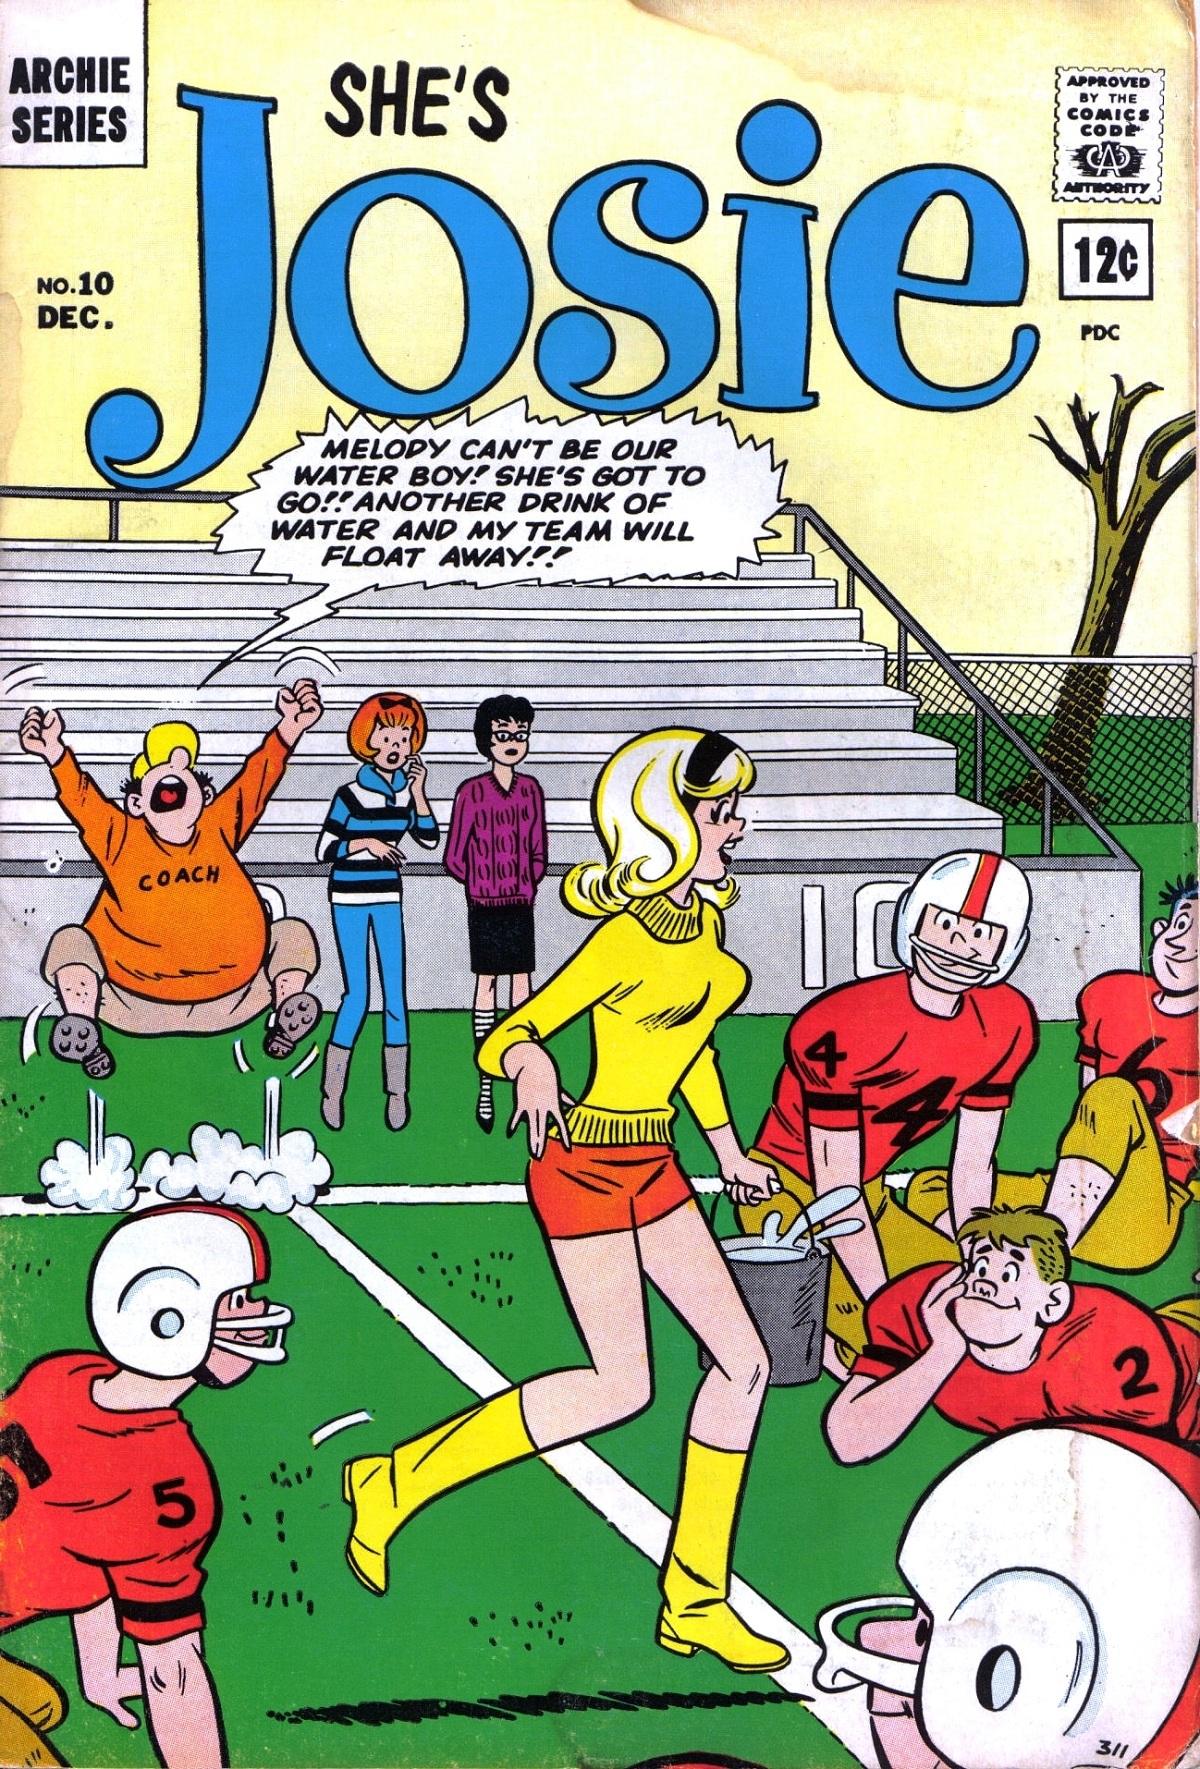 Read online She's Josie comic -  Issue #10 - 1